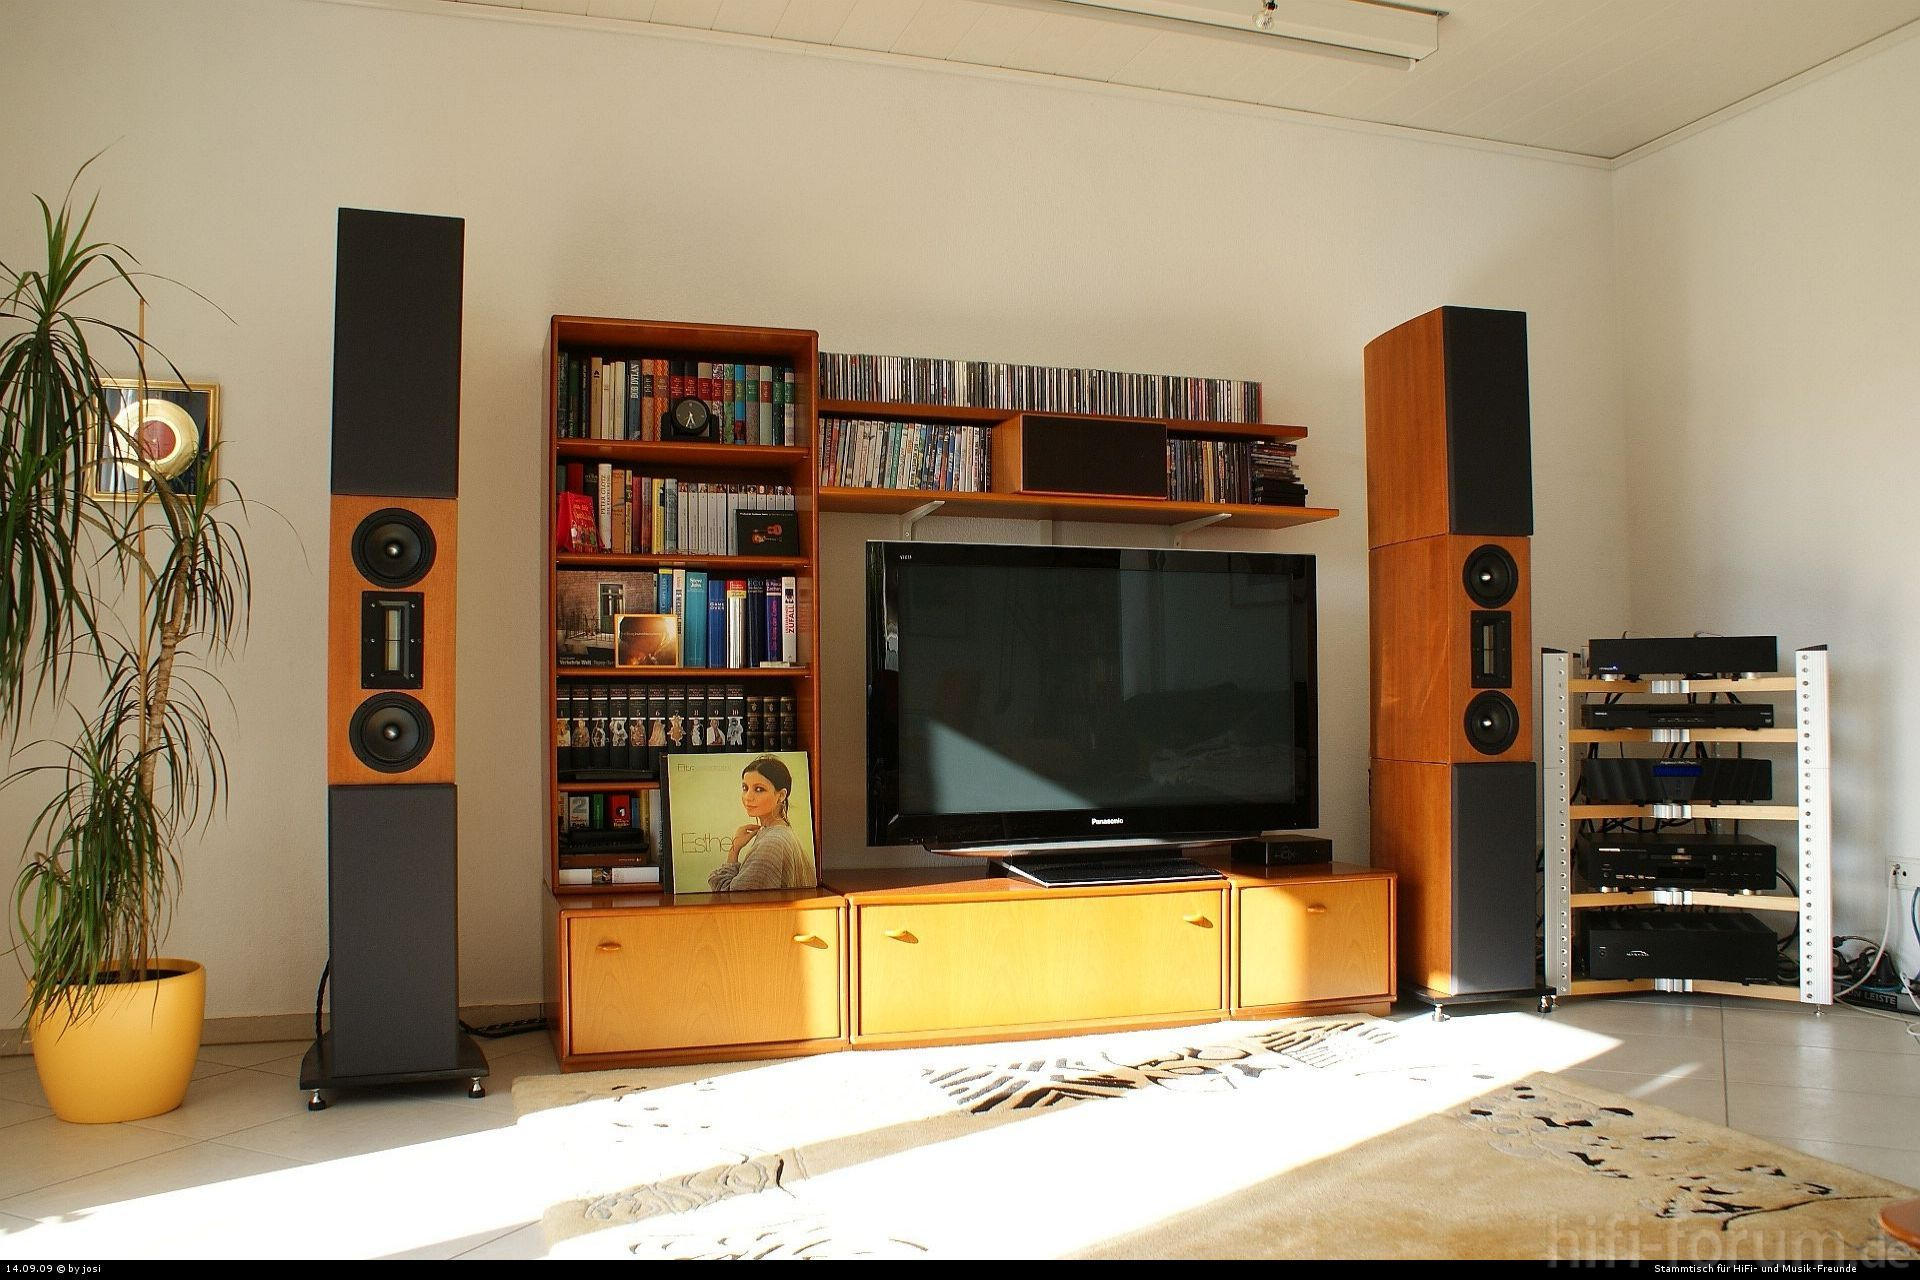 triptychon triptychon hifi bildergalerie. Black Bedroom Furniture Sets. Home Design Ideas